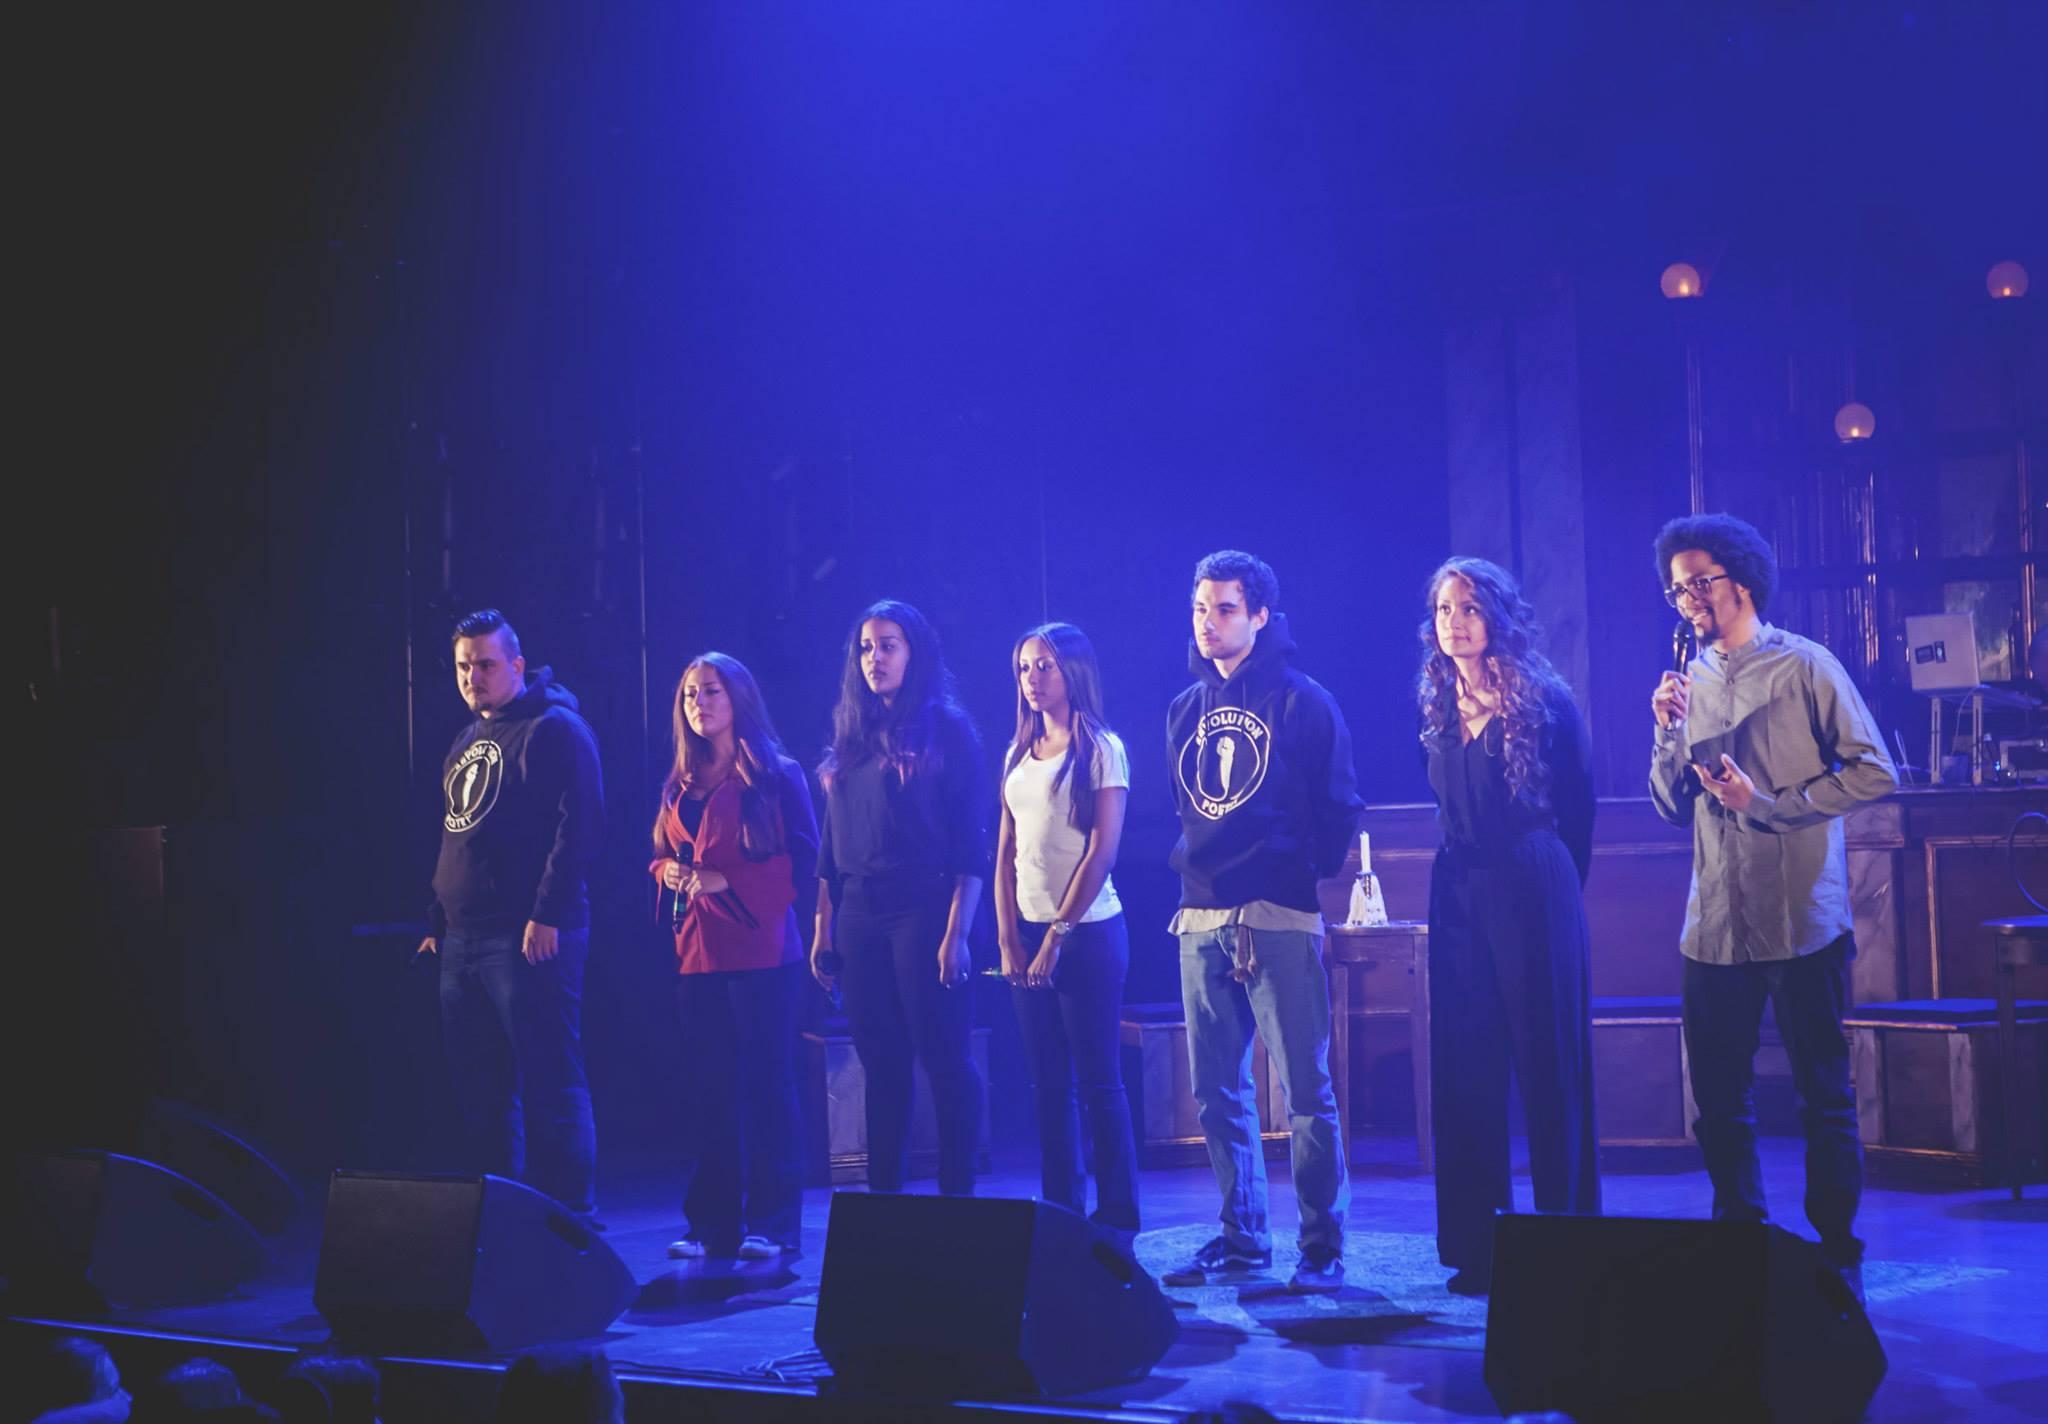 Salih Bilic, Nawroz Zakholy, Makda Embaie, Yodit, Girmay, Neftali Cienfuegos, Rojda Sekersöz, S.T.I.C.S. på Folkoperan 2015. Foto: Cim Ek.